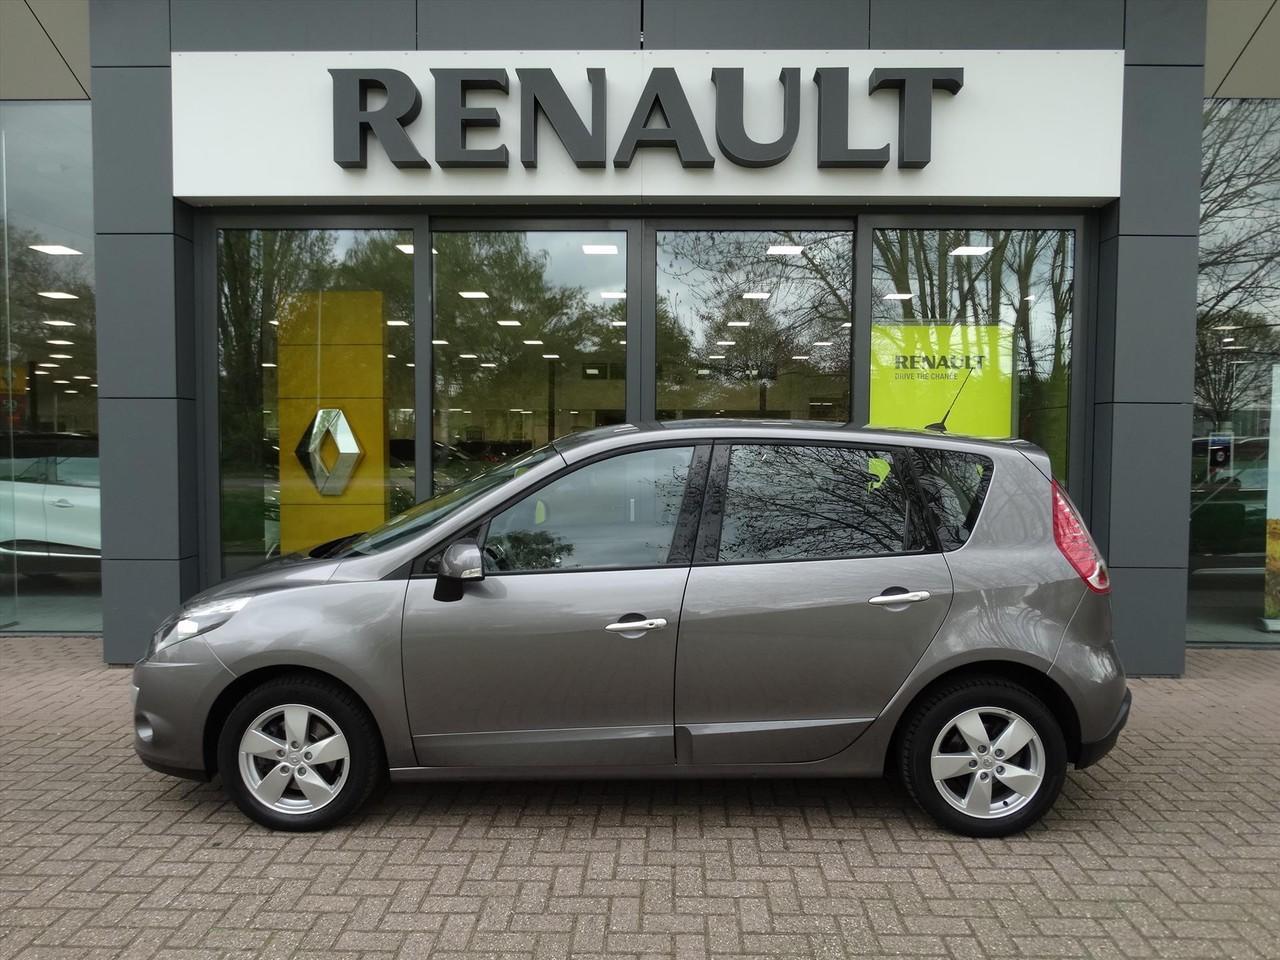 Renault Scénic Iii 1.6 16v 110 pk dynamique